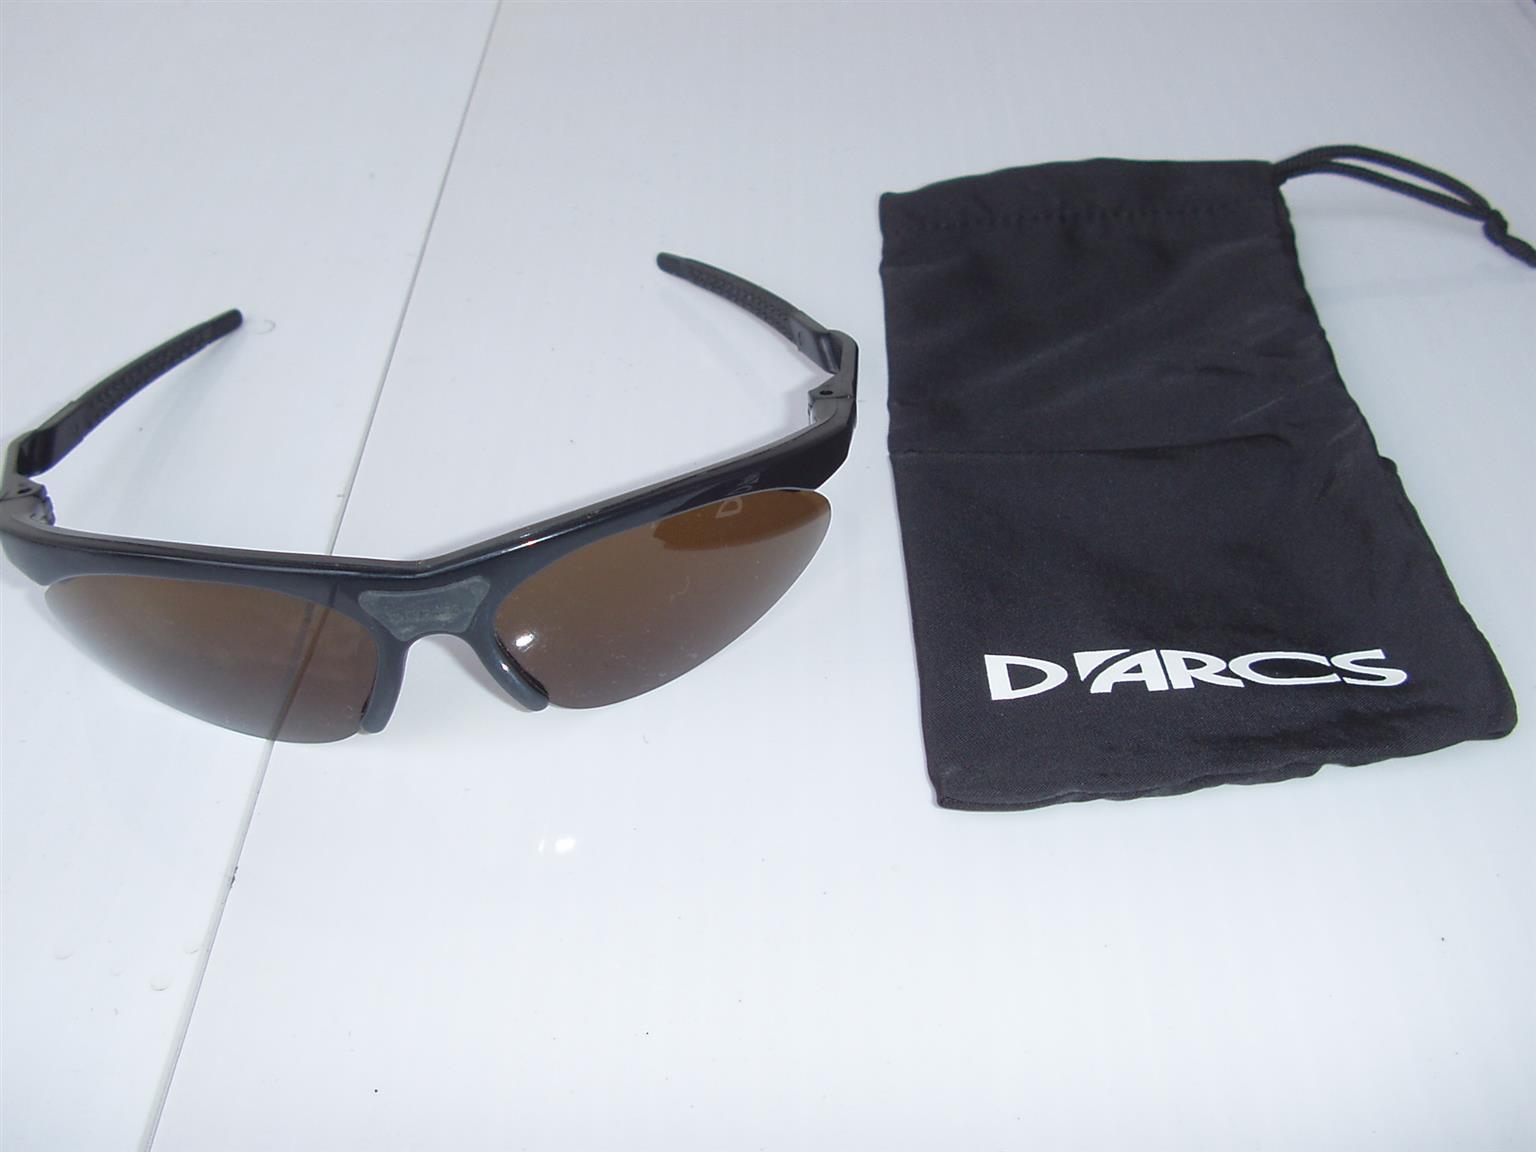 Darcs  Cycling Sunglasses